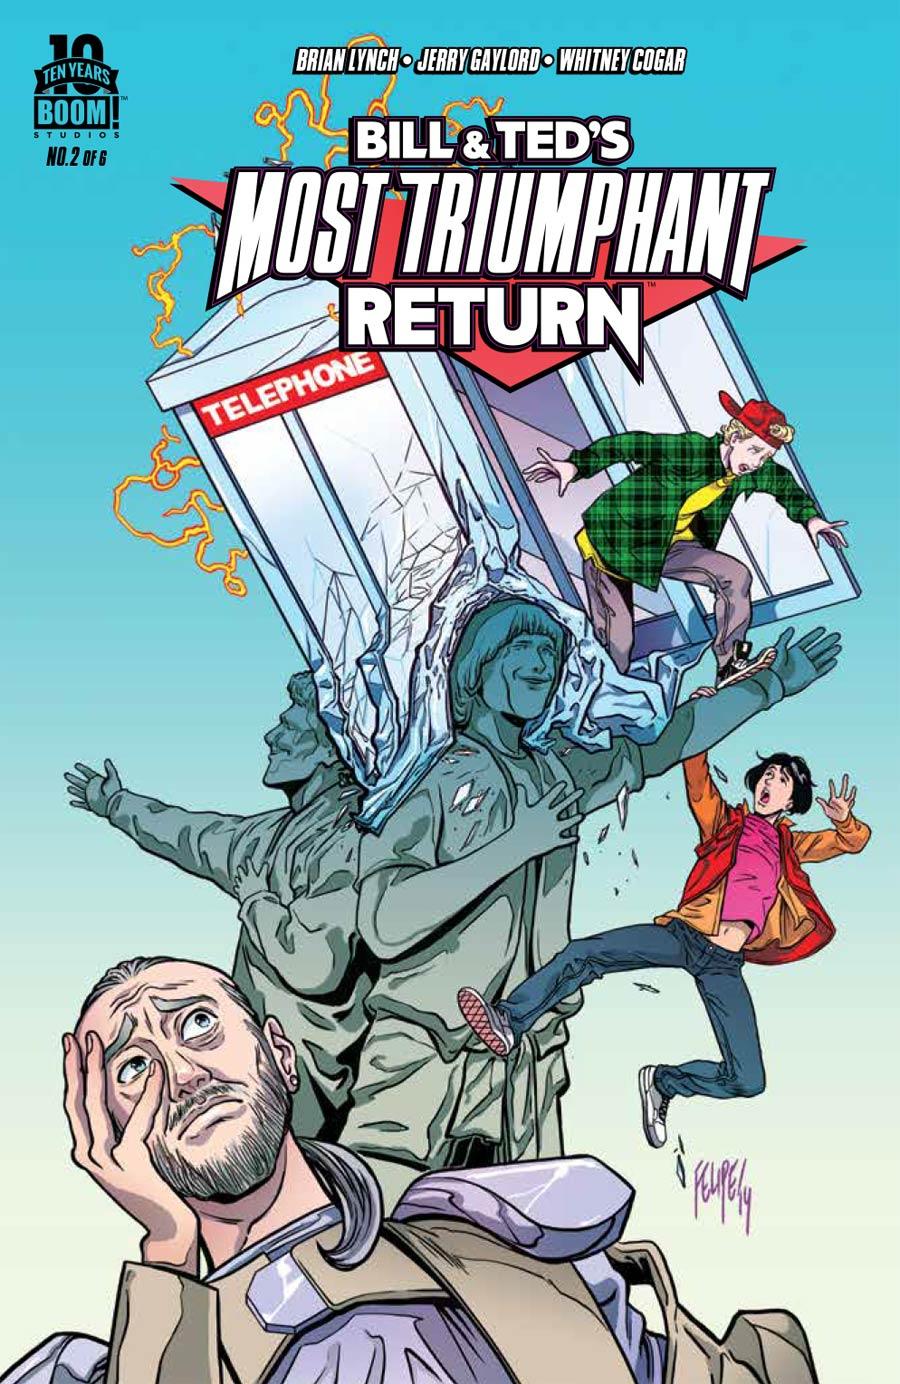 Bill & Teds Most Triumphant Return #2 Cover A Regular Felipe Smith Cover